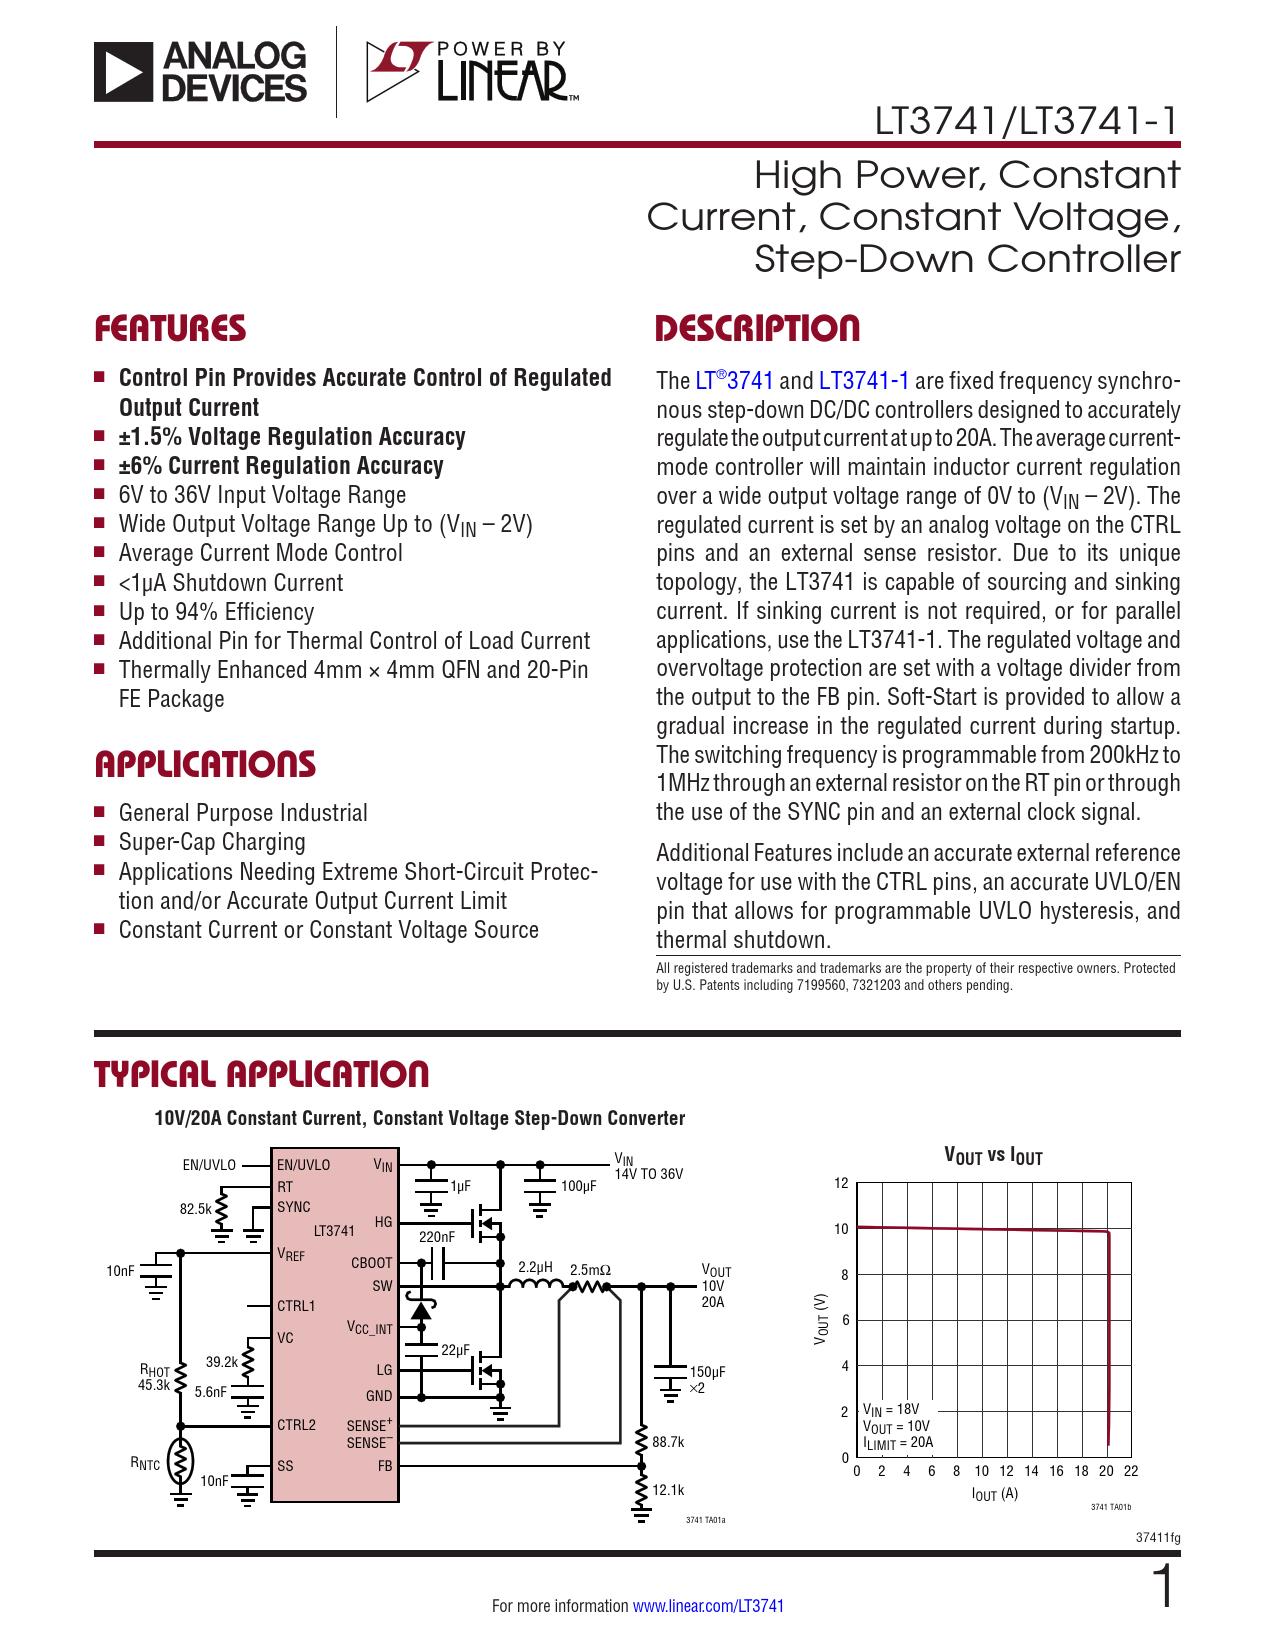 Datasheet LT3741, LT3741-1 Analog Devices